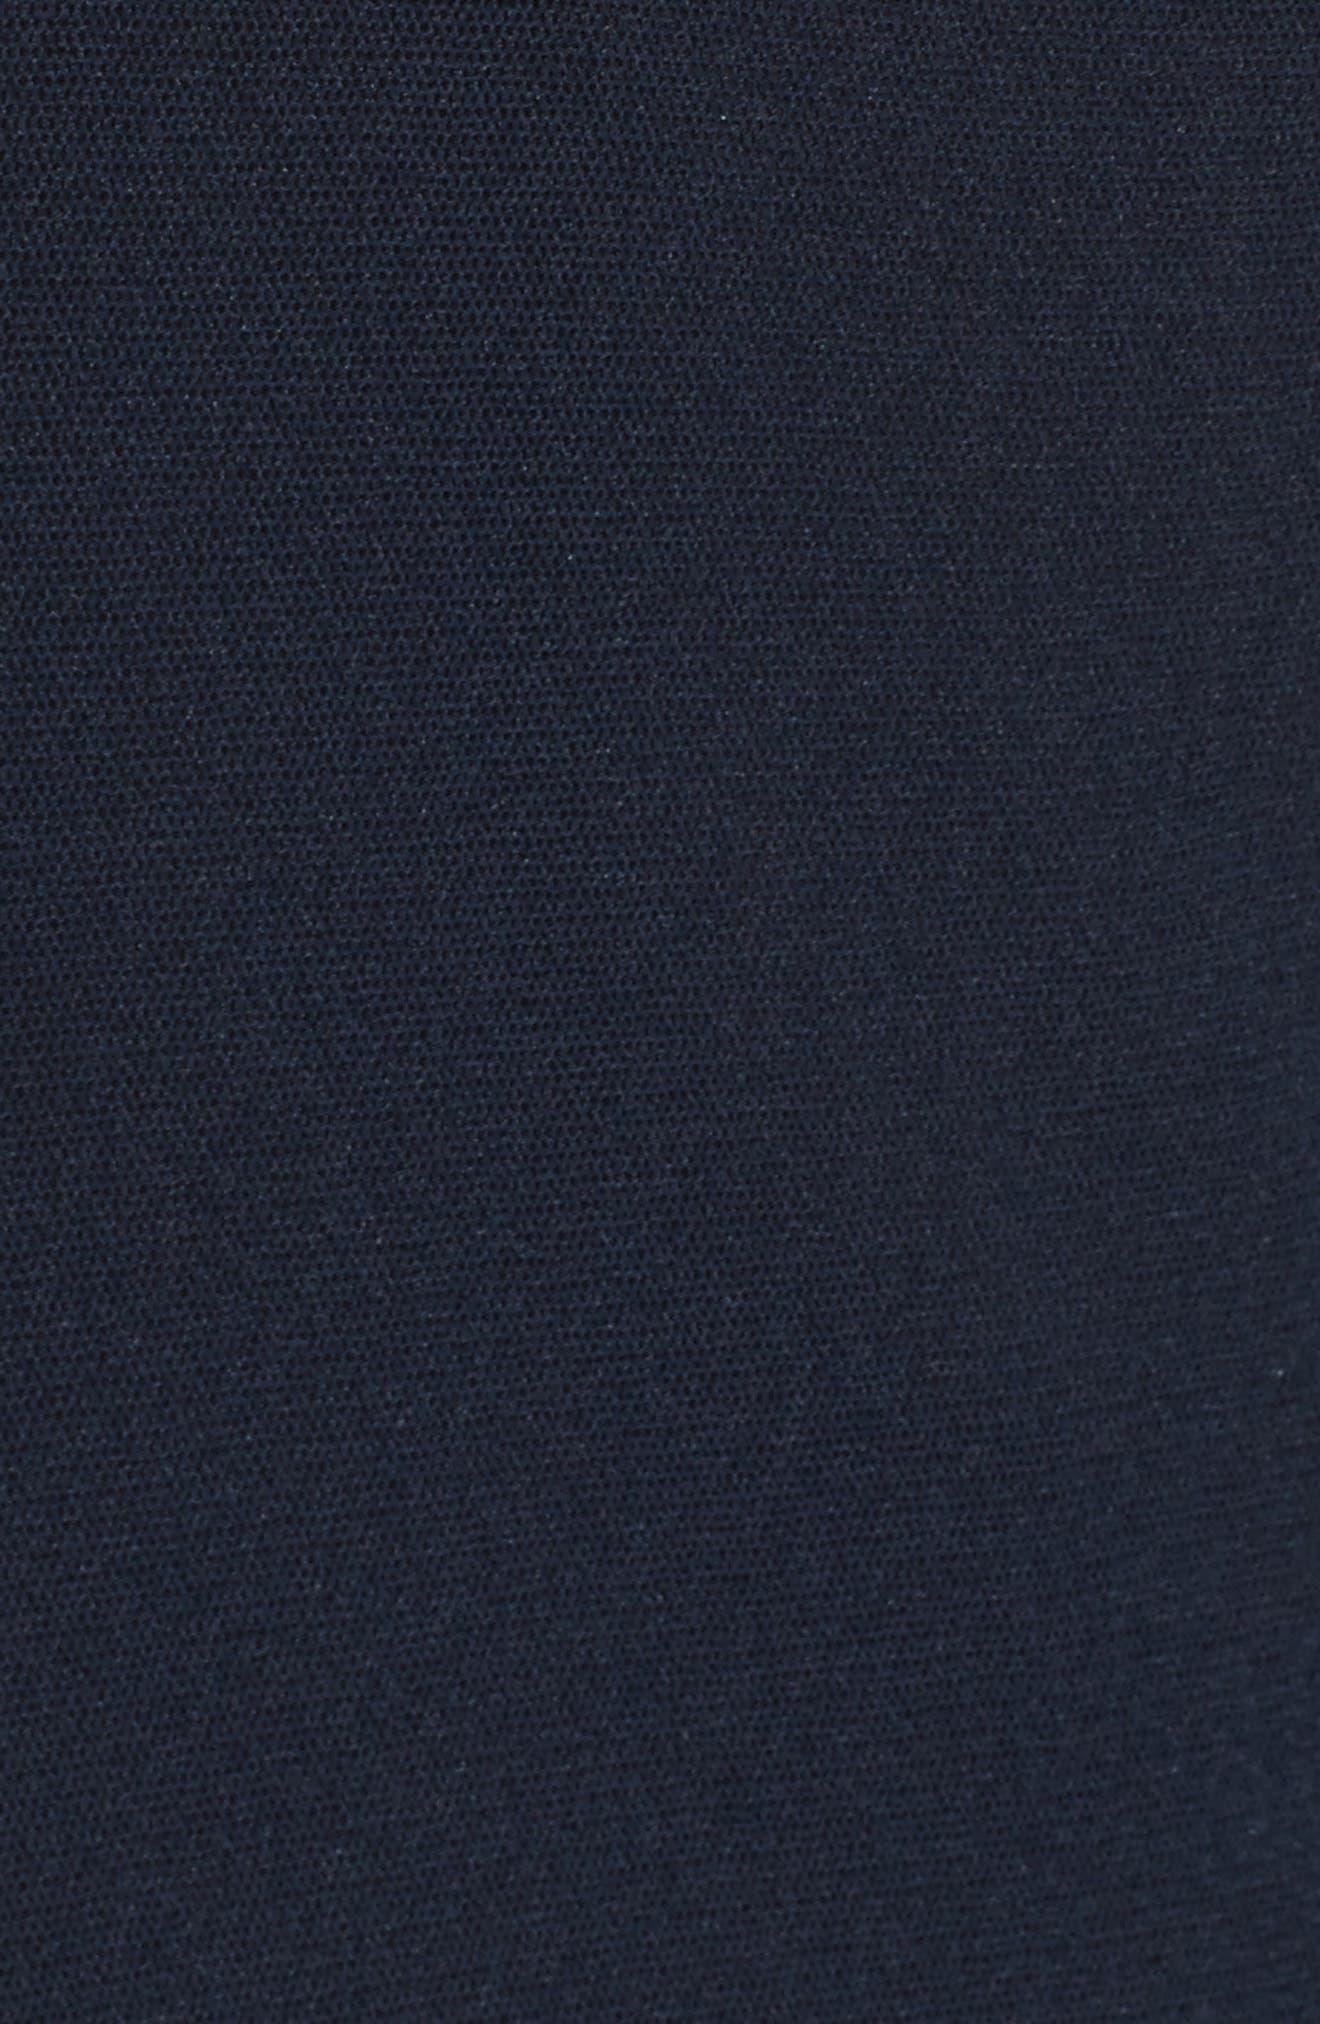 Alternate Image 3  - Fuzzi Reversible Tulle Dress